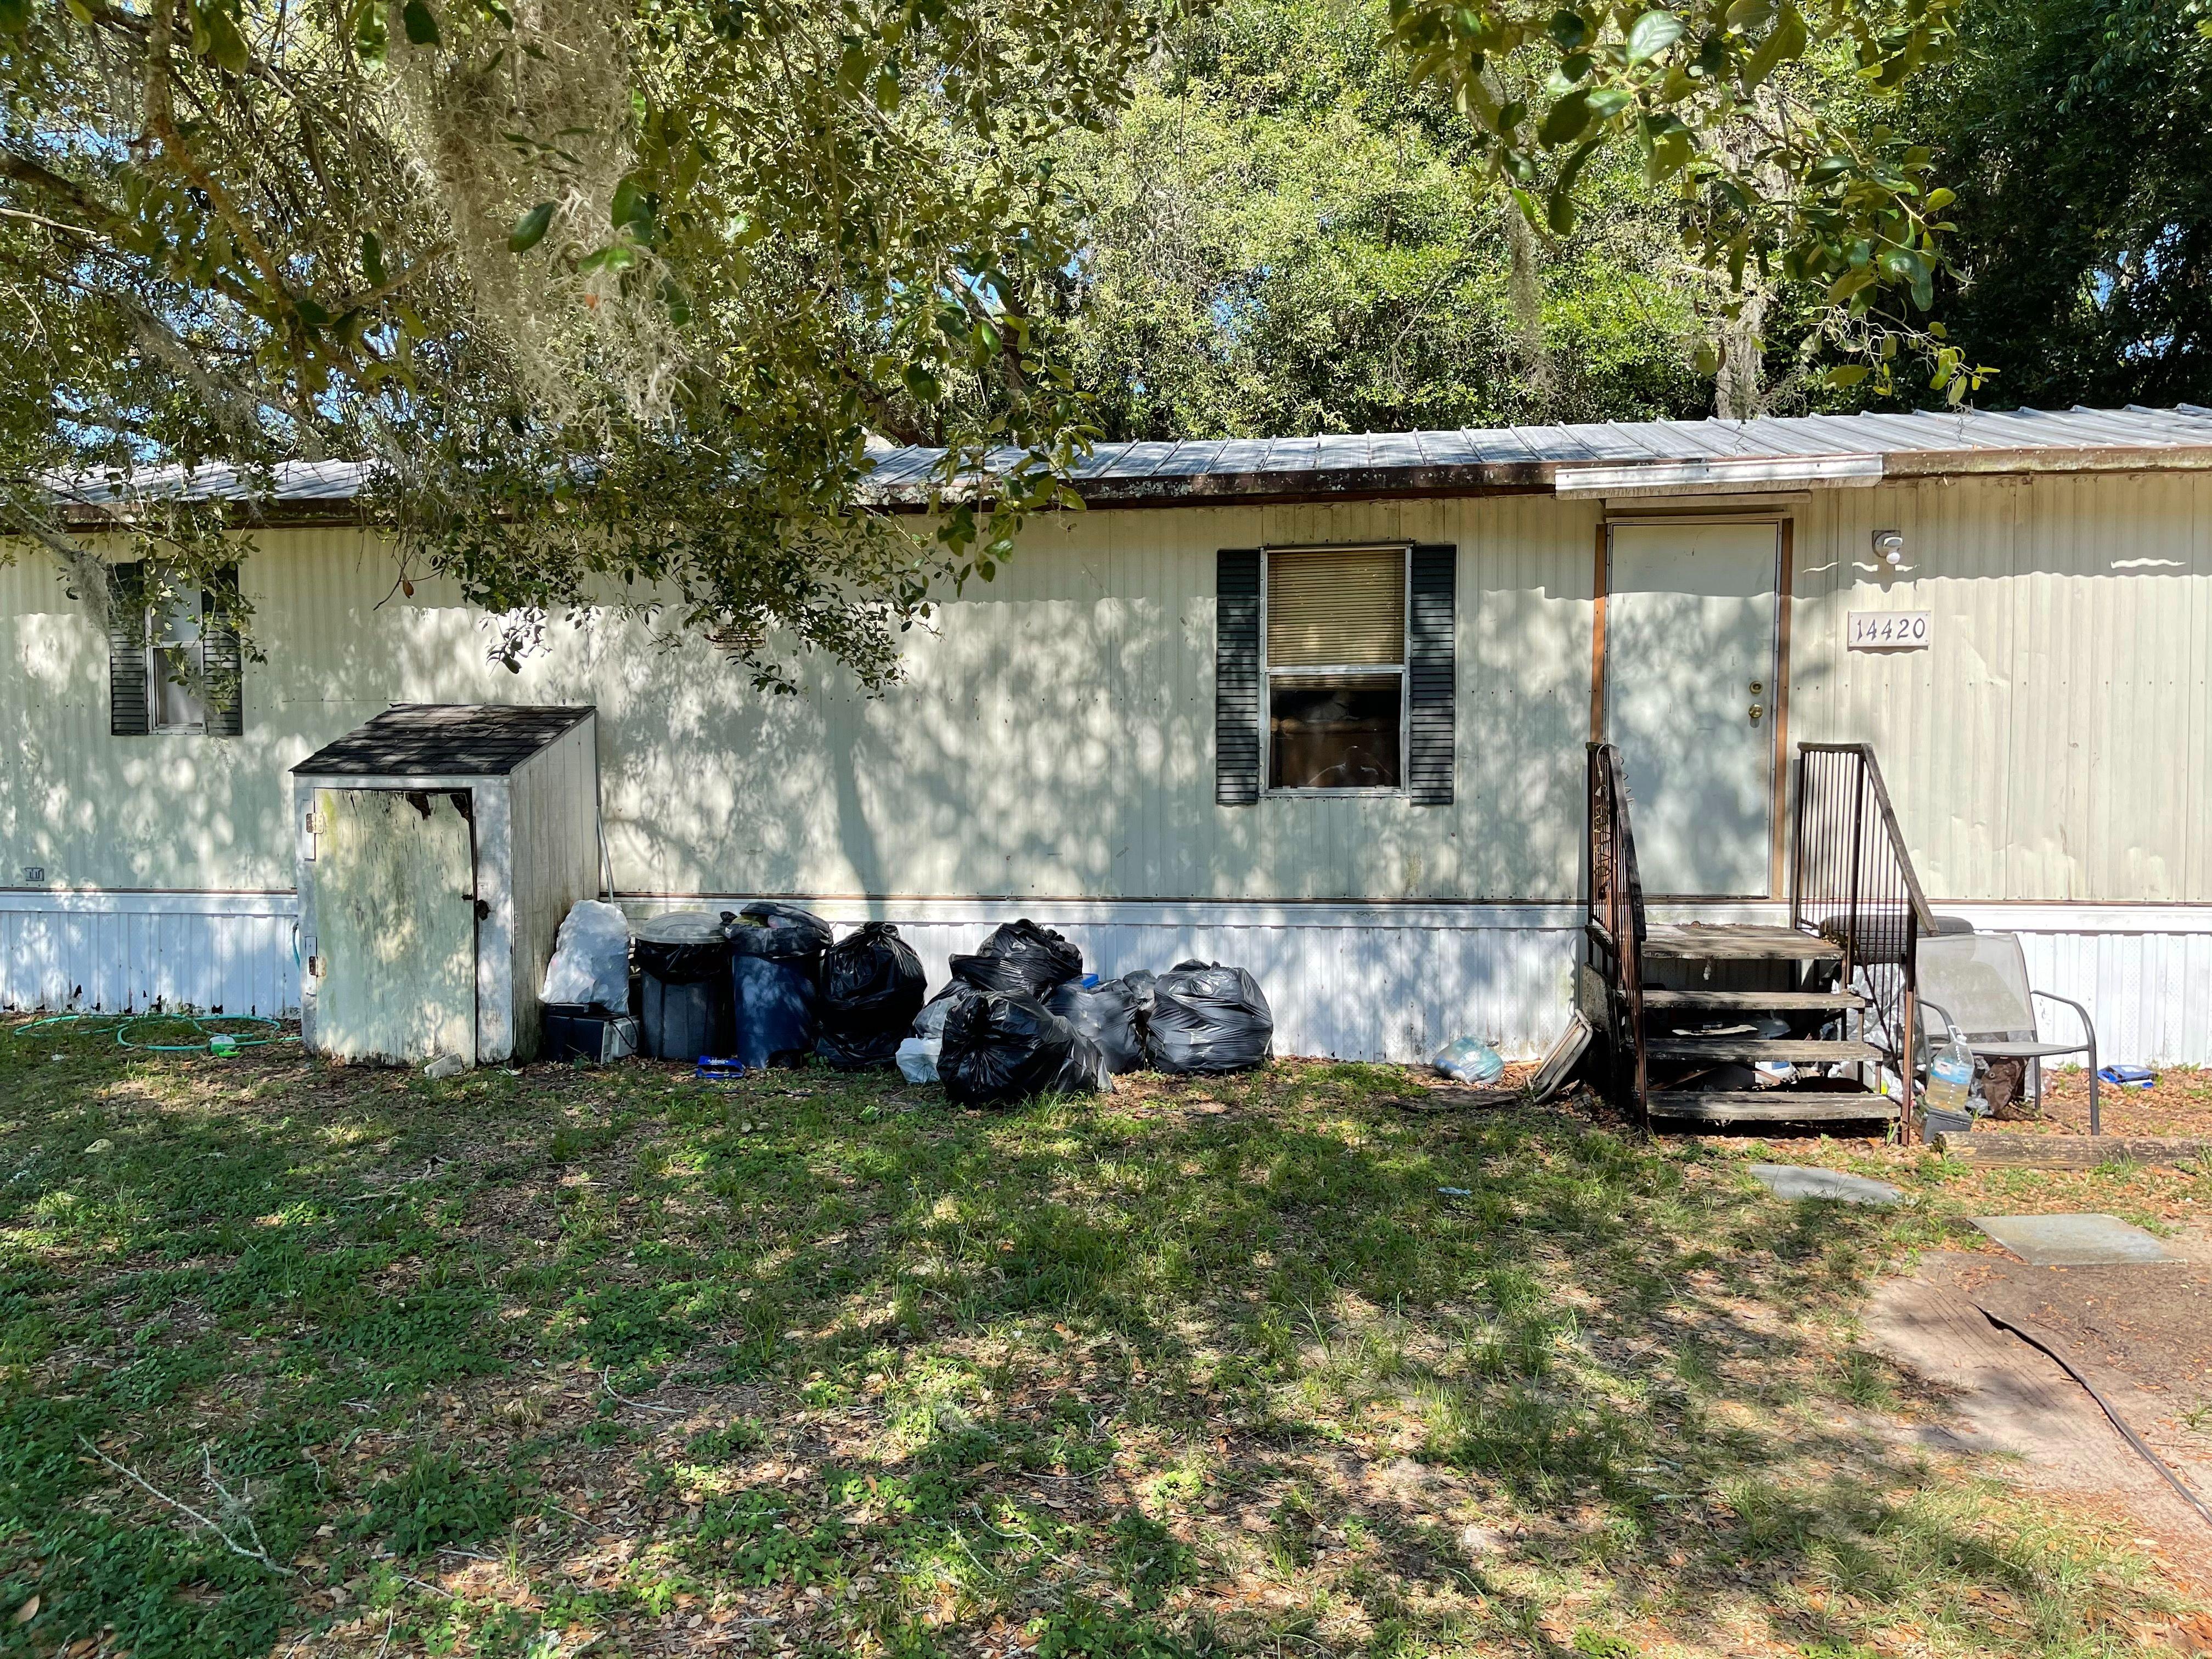 14420 SE 91st Ave, Summerfield, FL